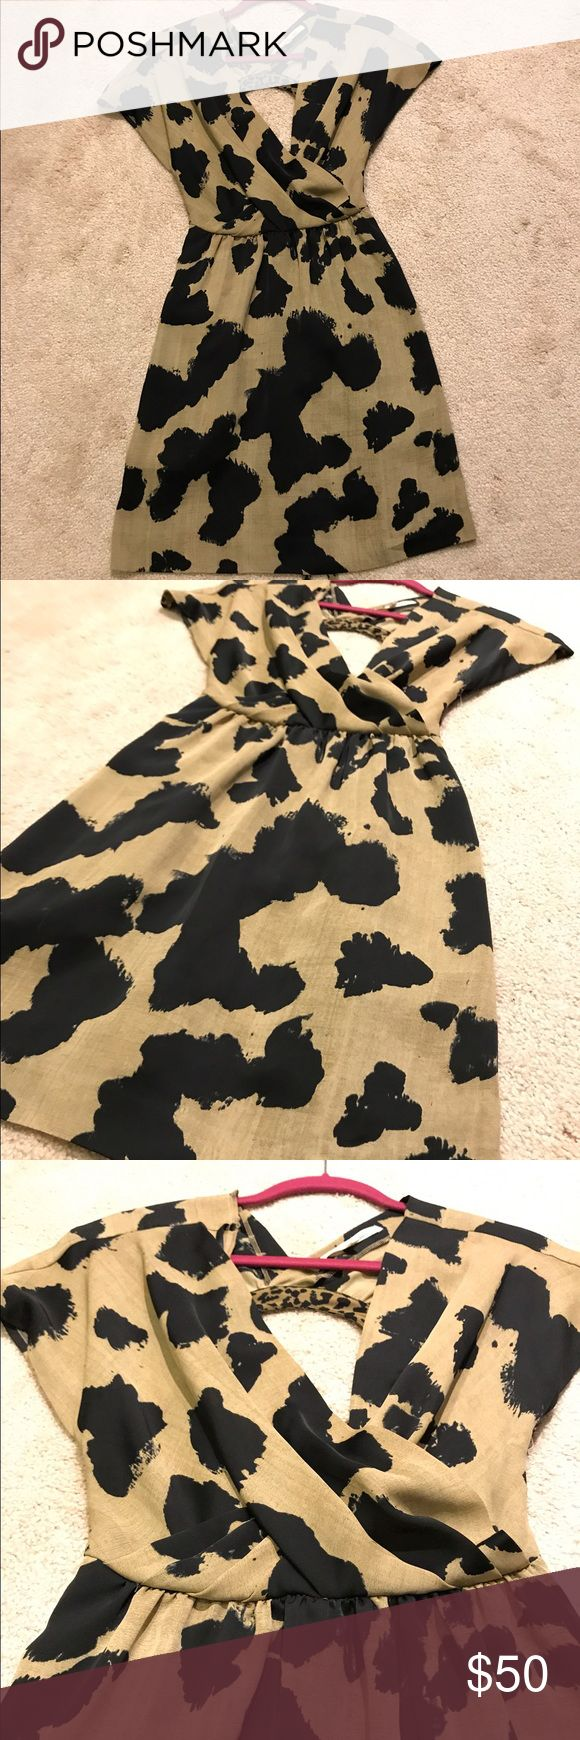 Rachel Roy Animal Print Short Dress Size XXS Rachel Roy, black and beige animal print dress. Size XXS, short dress. Keyhole back and apron style tie back. In excellent, like new condition! Rachel Roy Dresses Mini